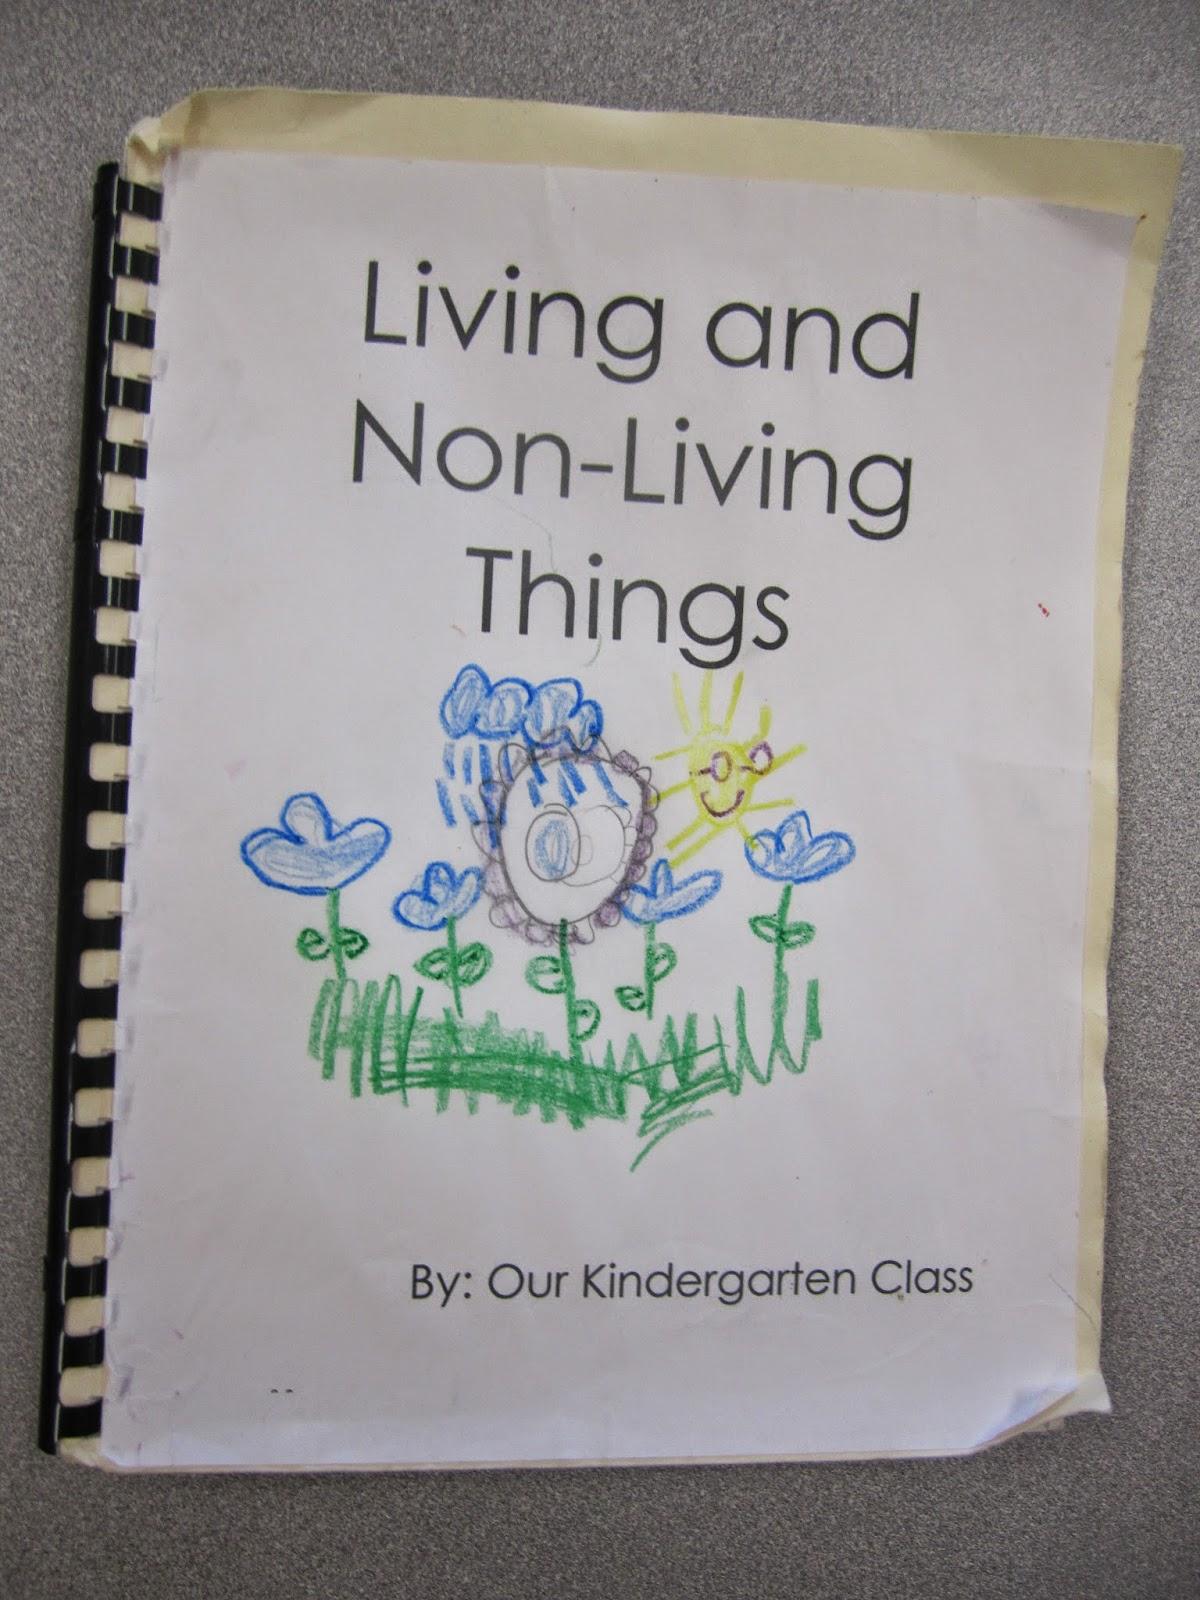 Mrs Parisi S Kindergarten Class